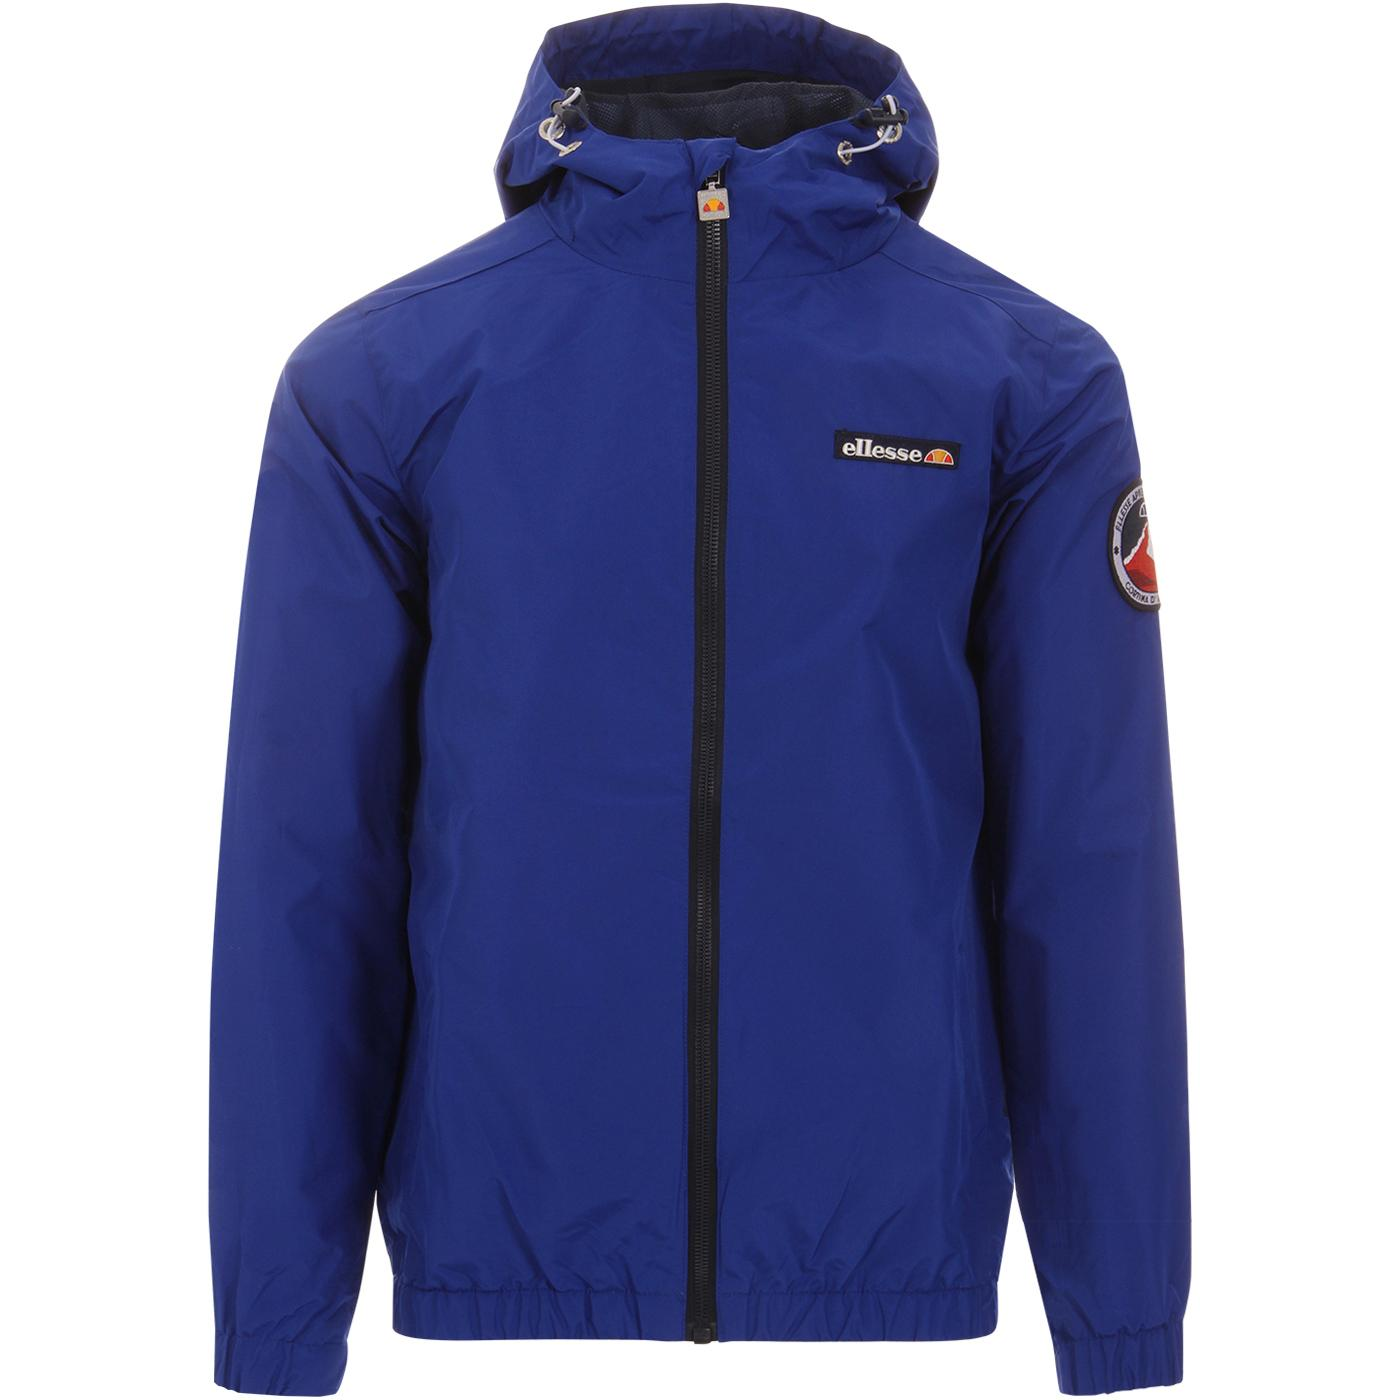 Terrazzo ELLESSE Mens 80s Hooded Terrace Jacket BL